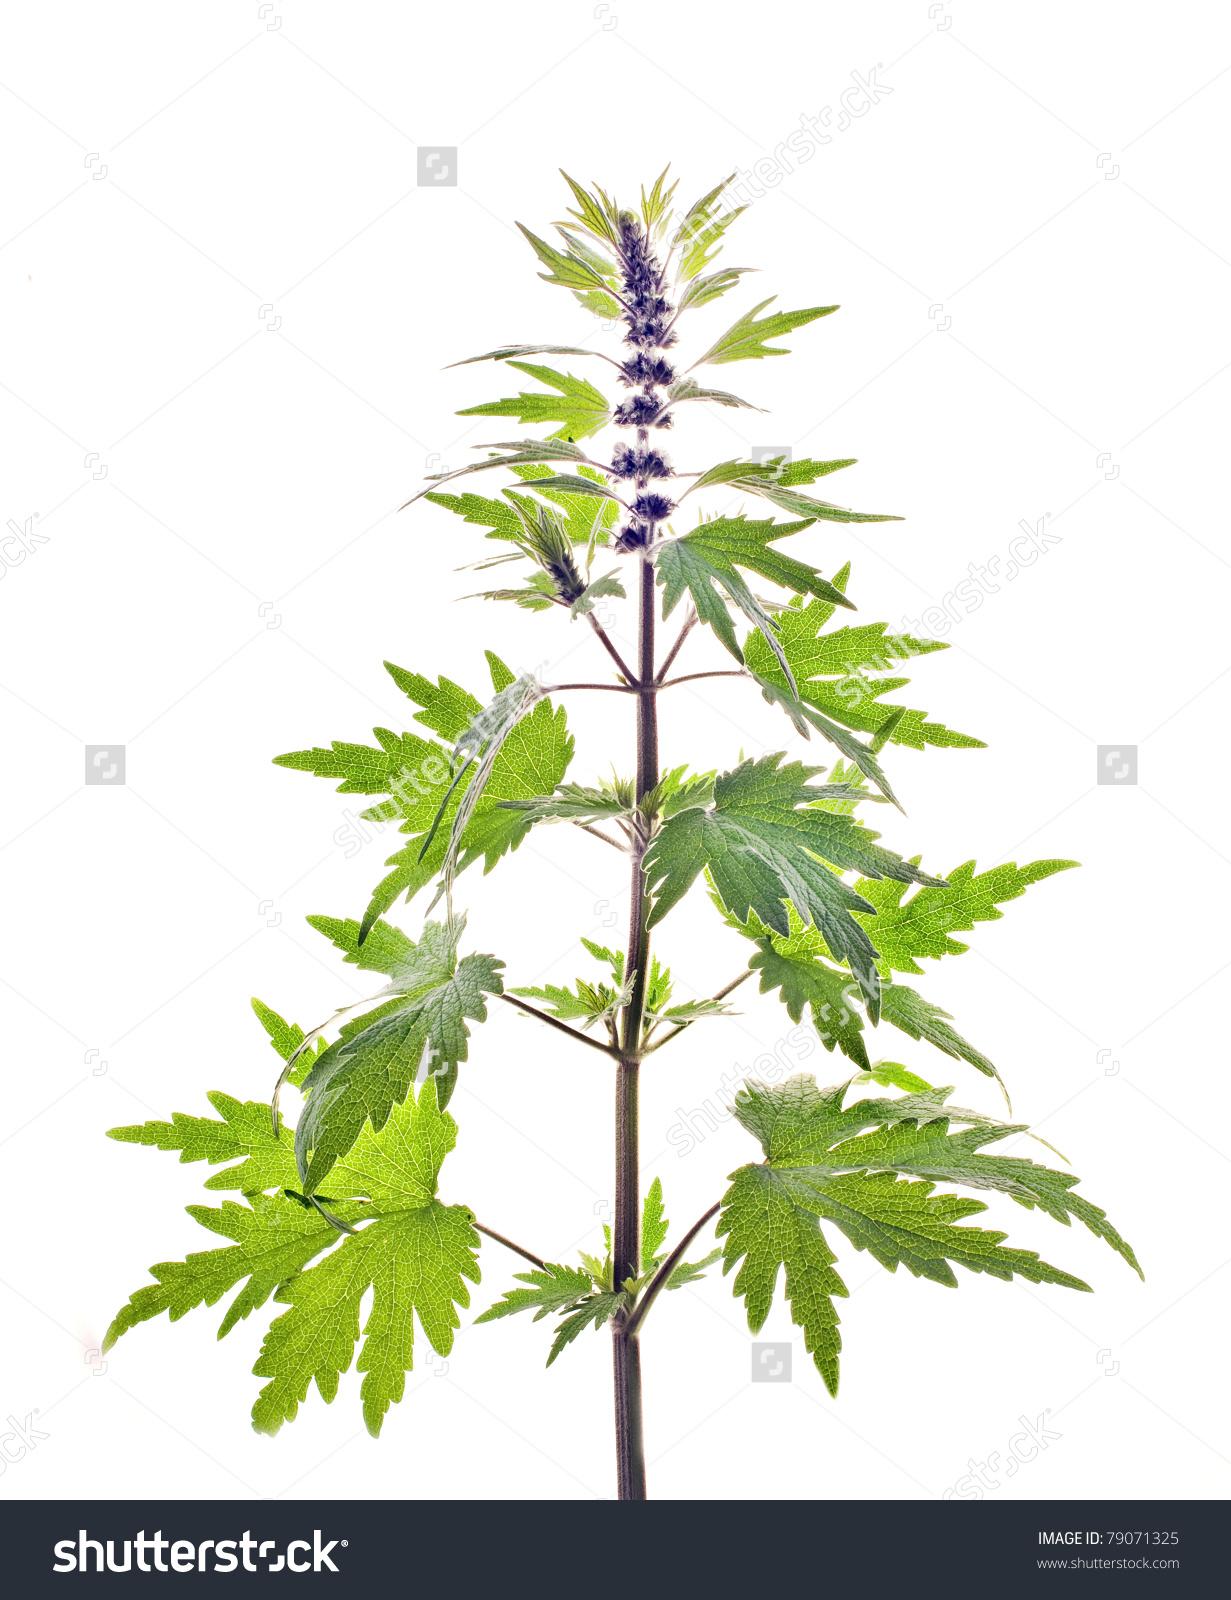 Motherwort, Leonurus L. Stock Photo 79071325 : Shutterstock.